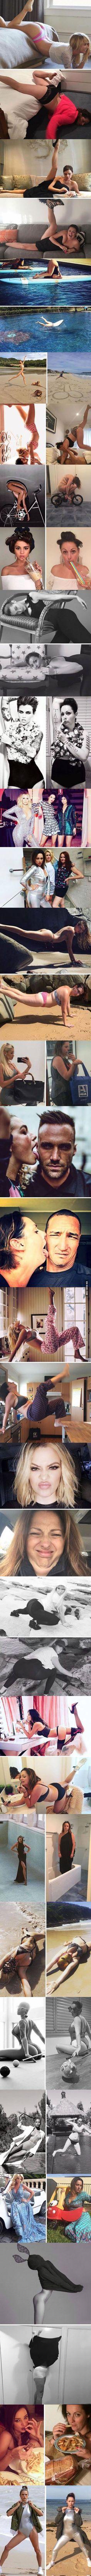 Woman reenacts celebrities photos: